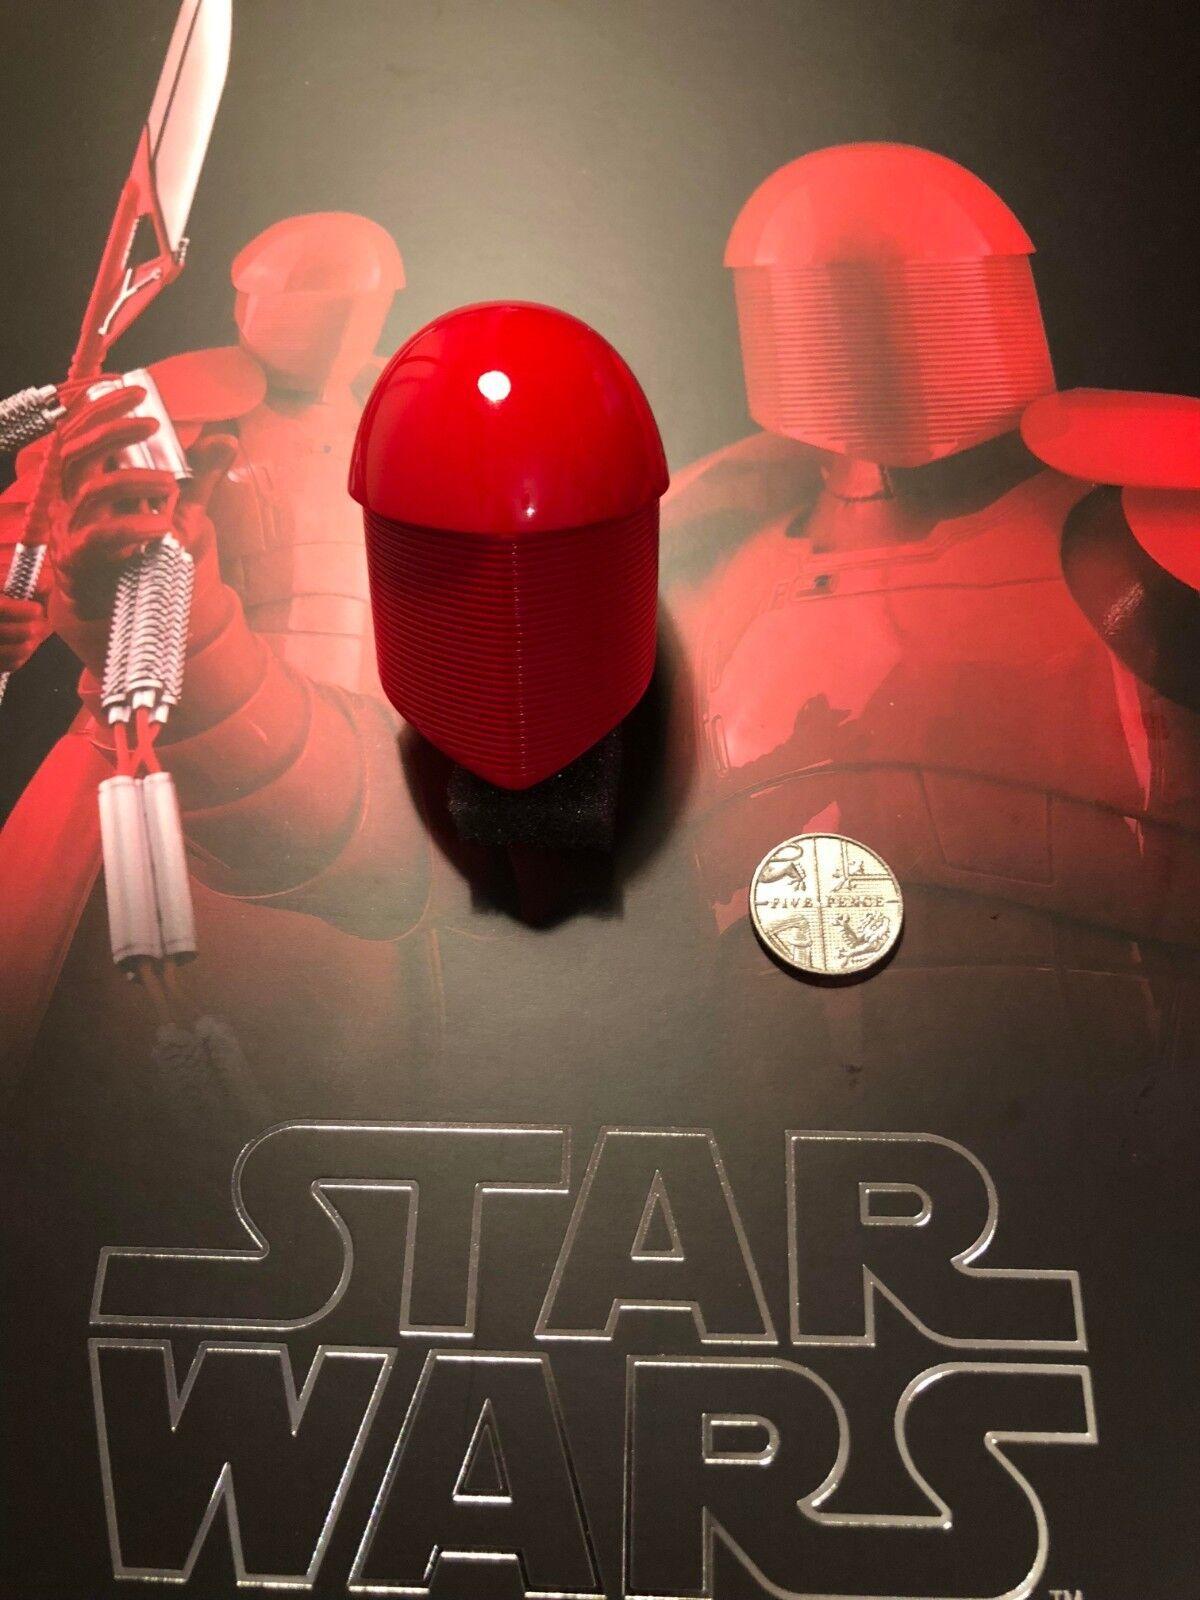 Hot Toys Star Wars Praetorian Praetorian Praetorian Guard HB Helmet Head Sculpt loose 1 6th scale 8d3e1d